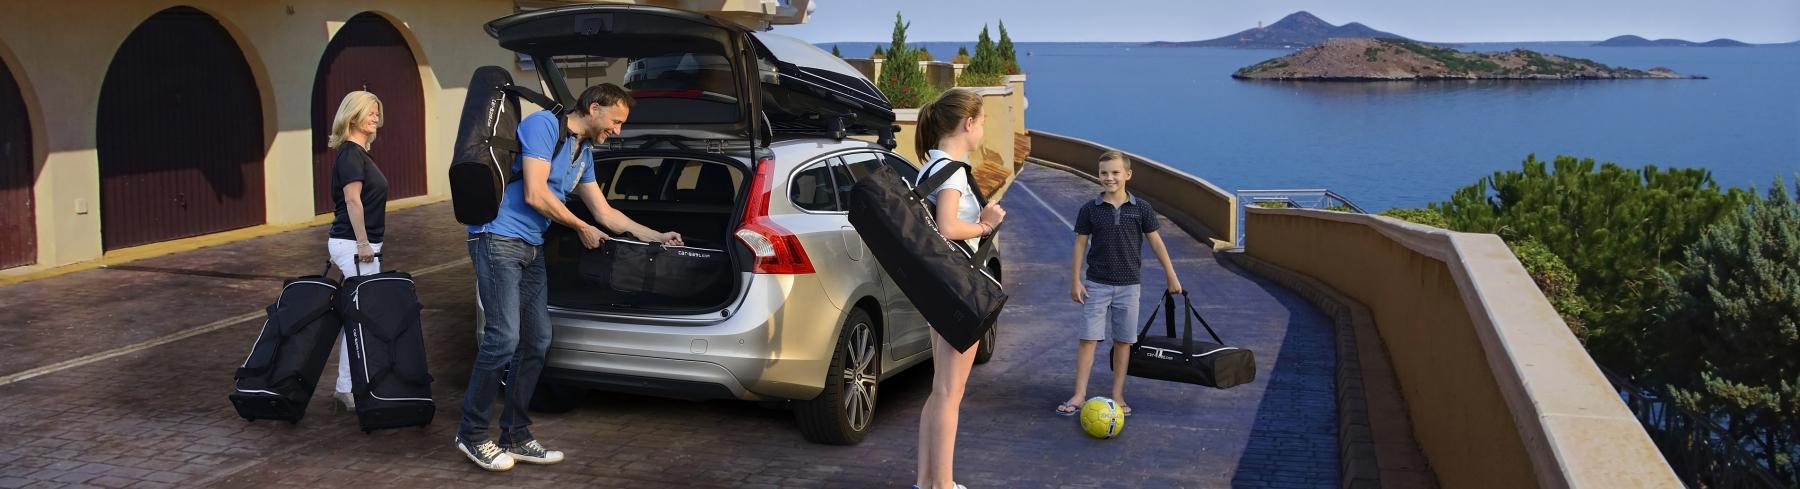 car-bags-voyage-sans-soucis-zomer